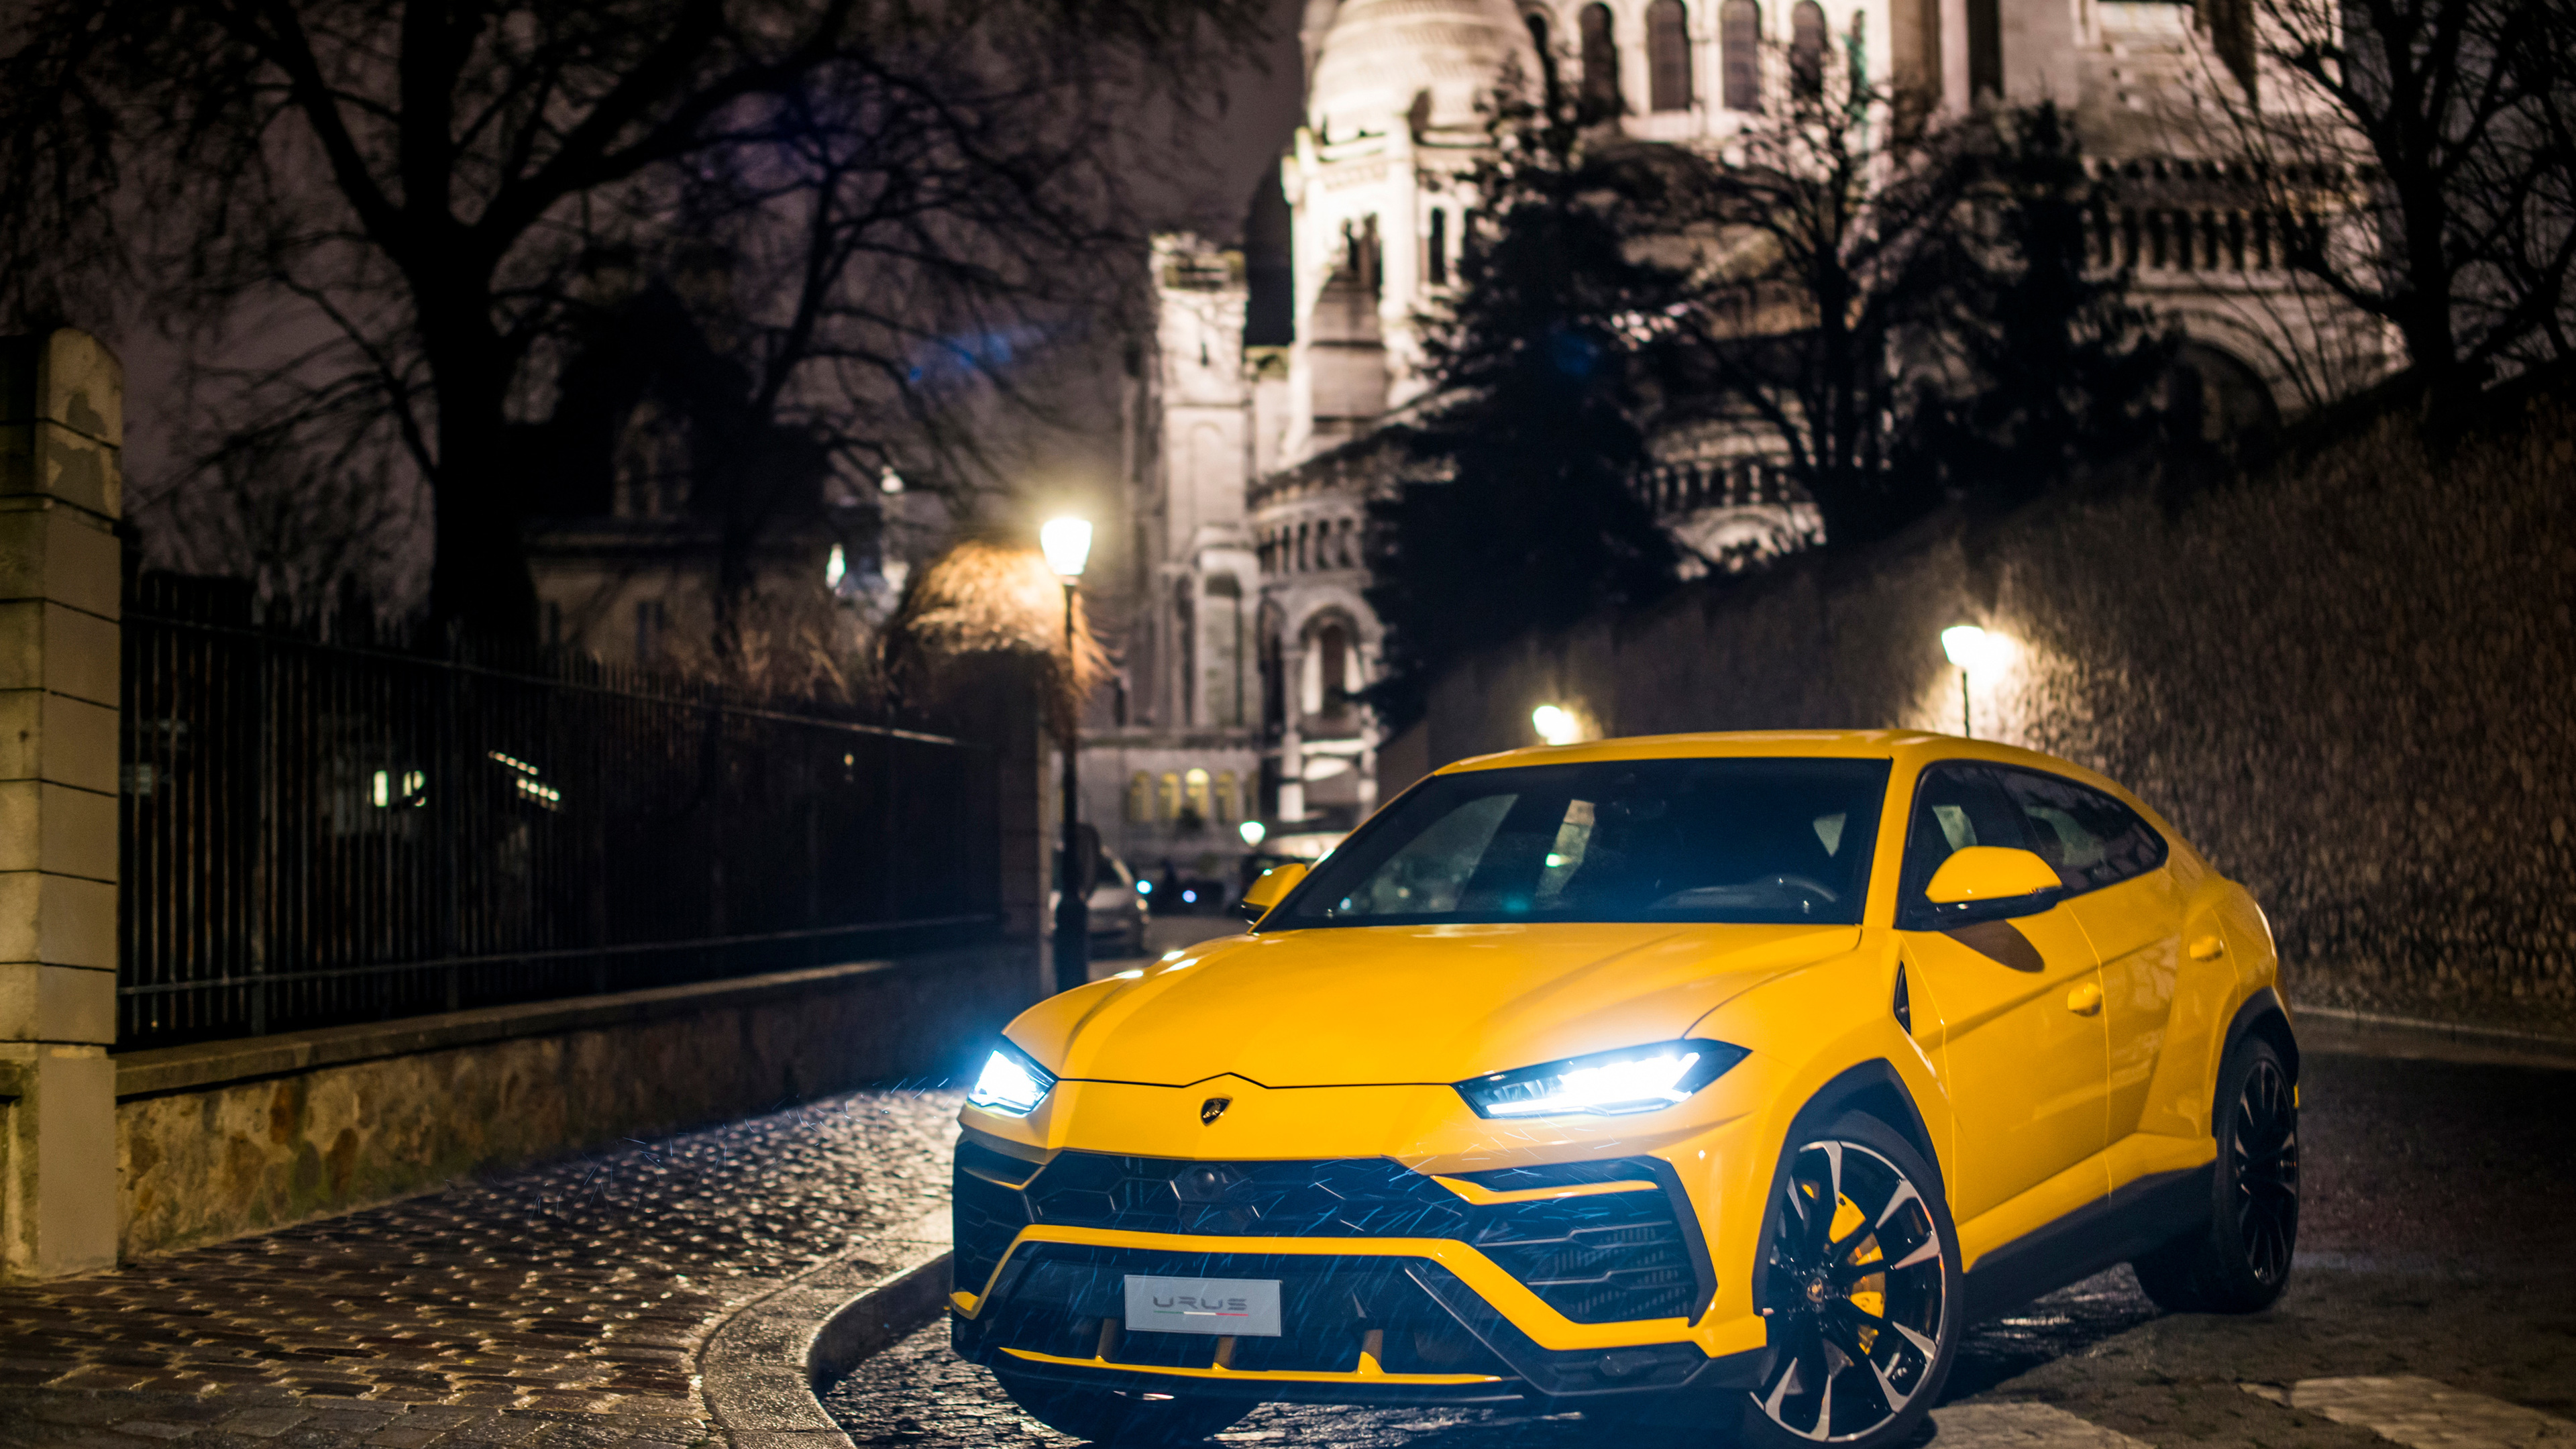 yellow lamborghini urus 2018 1539109326 - Yellow Lamborghini Urus 2018 - suv wallpapers, lamborghini wallpapers, lamborghini urus wallpapers, hd-wallpapers, cars wallpapers, 4k-wallpapers, 2018 cars wallpapers